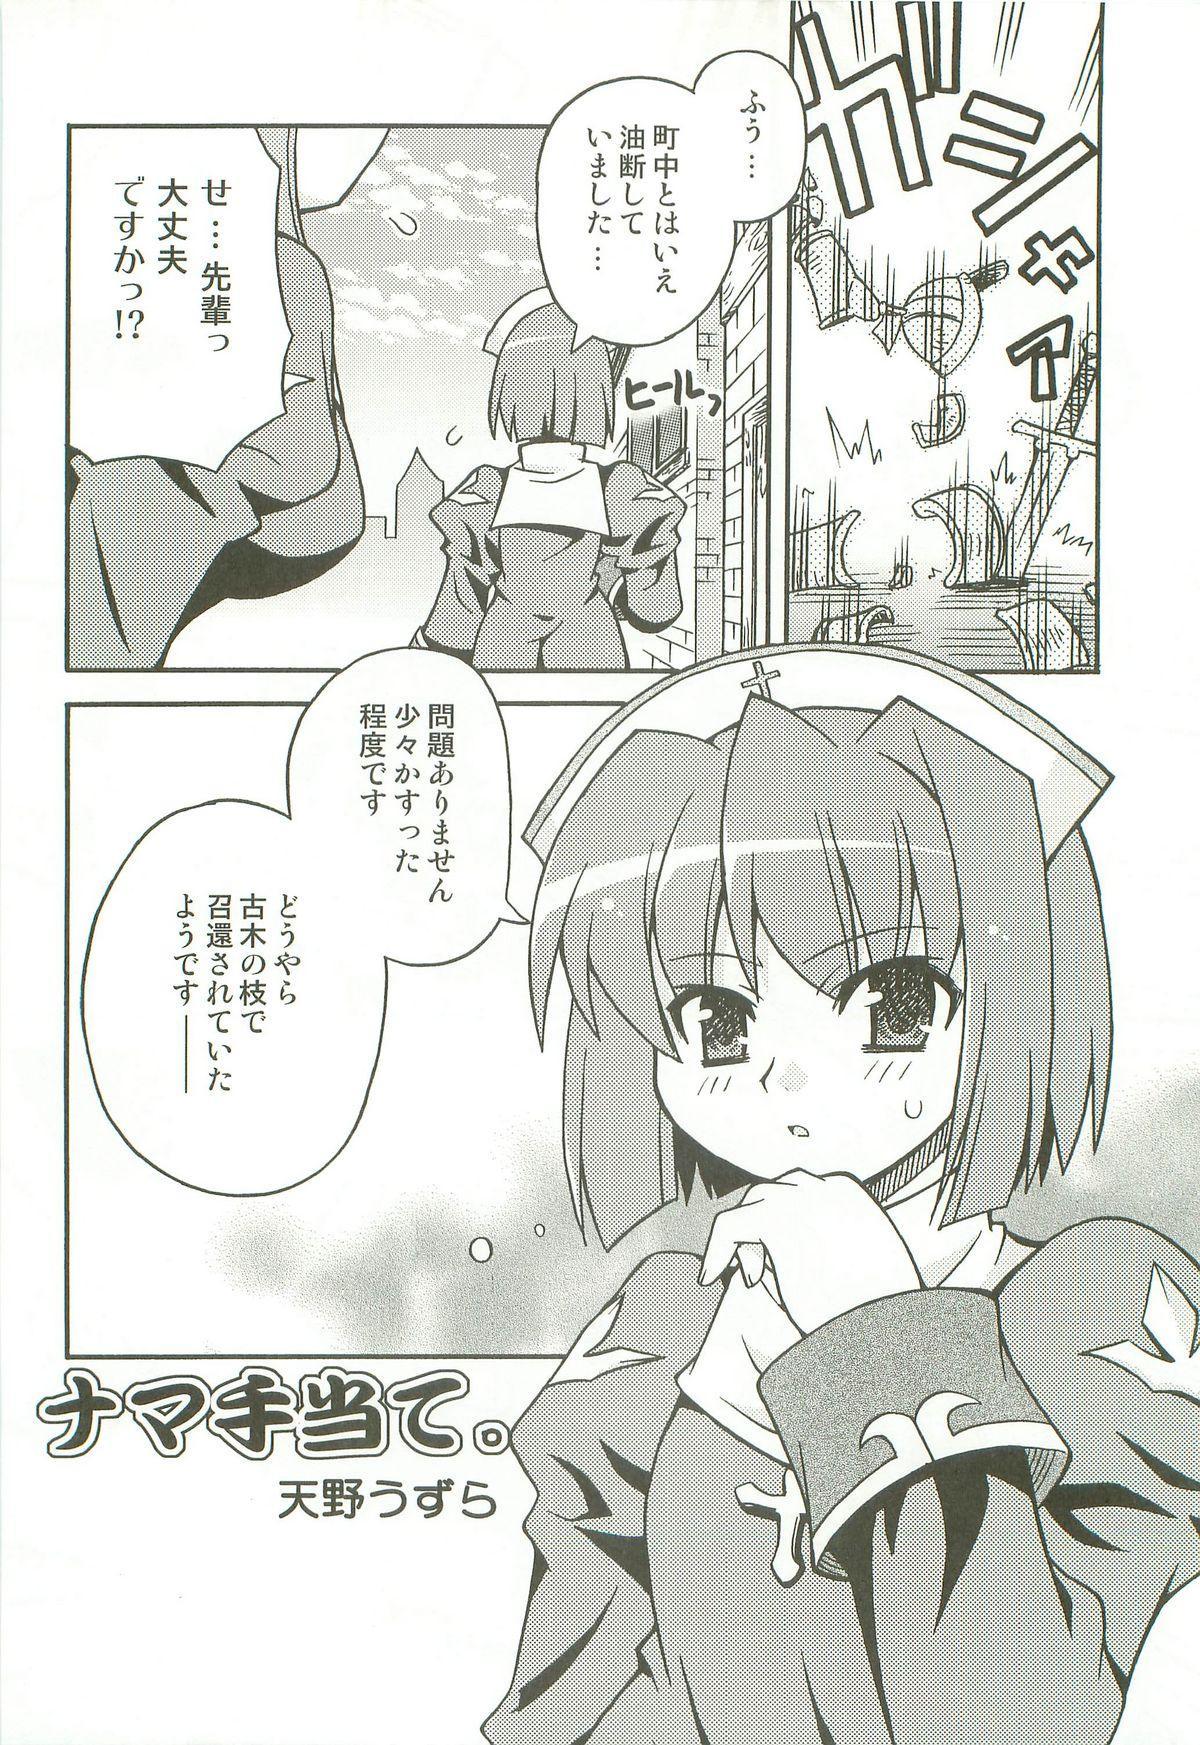 [Atelier Muse] toppatsu RO-bon naipota-sensei no chitcha kuteusui hon 12